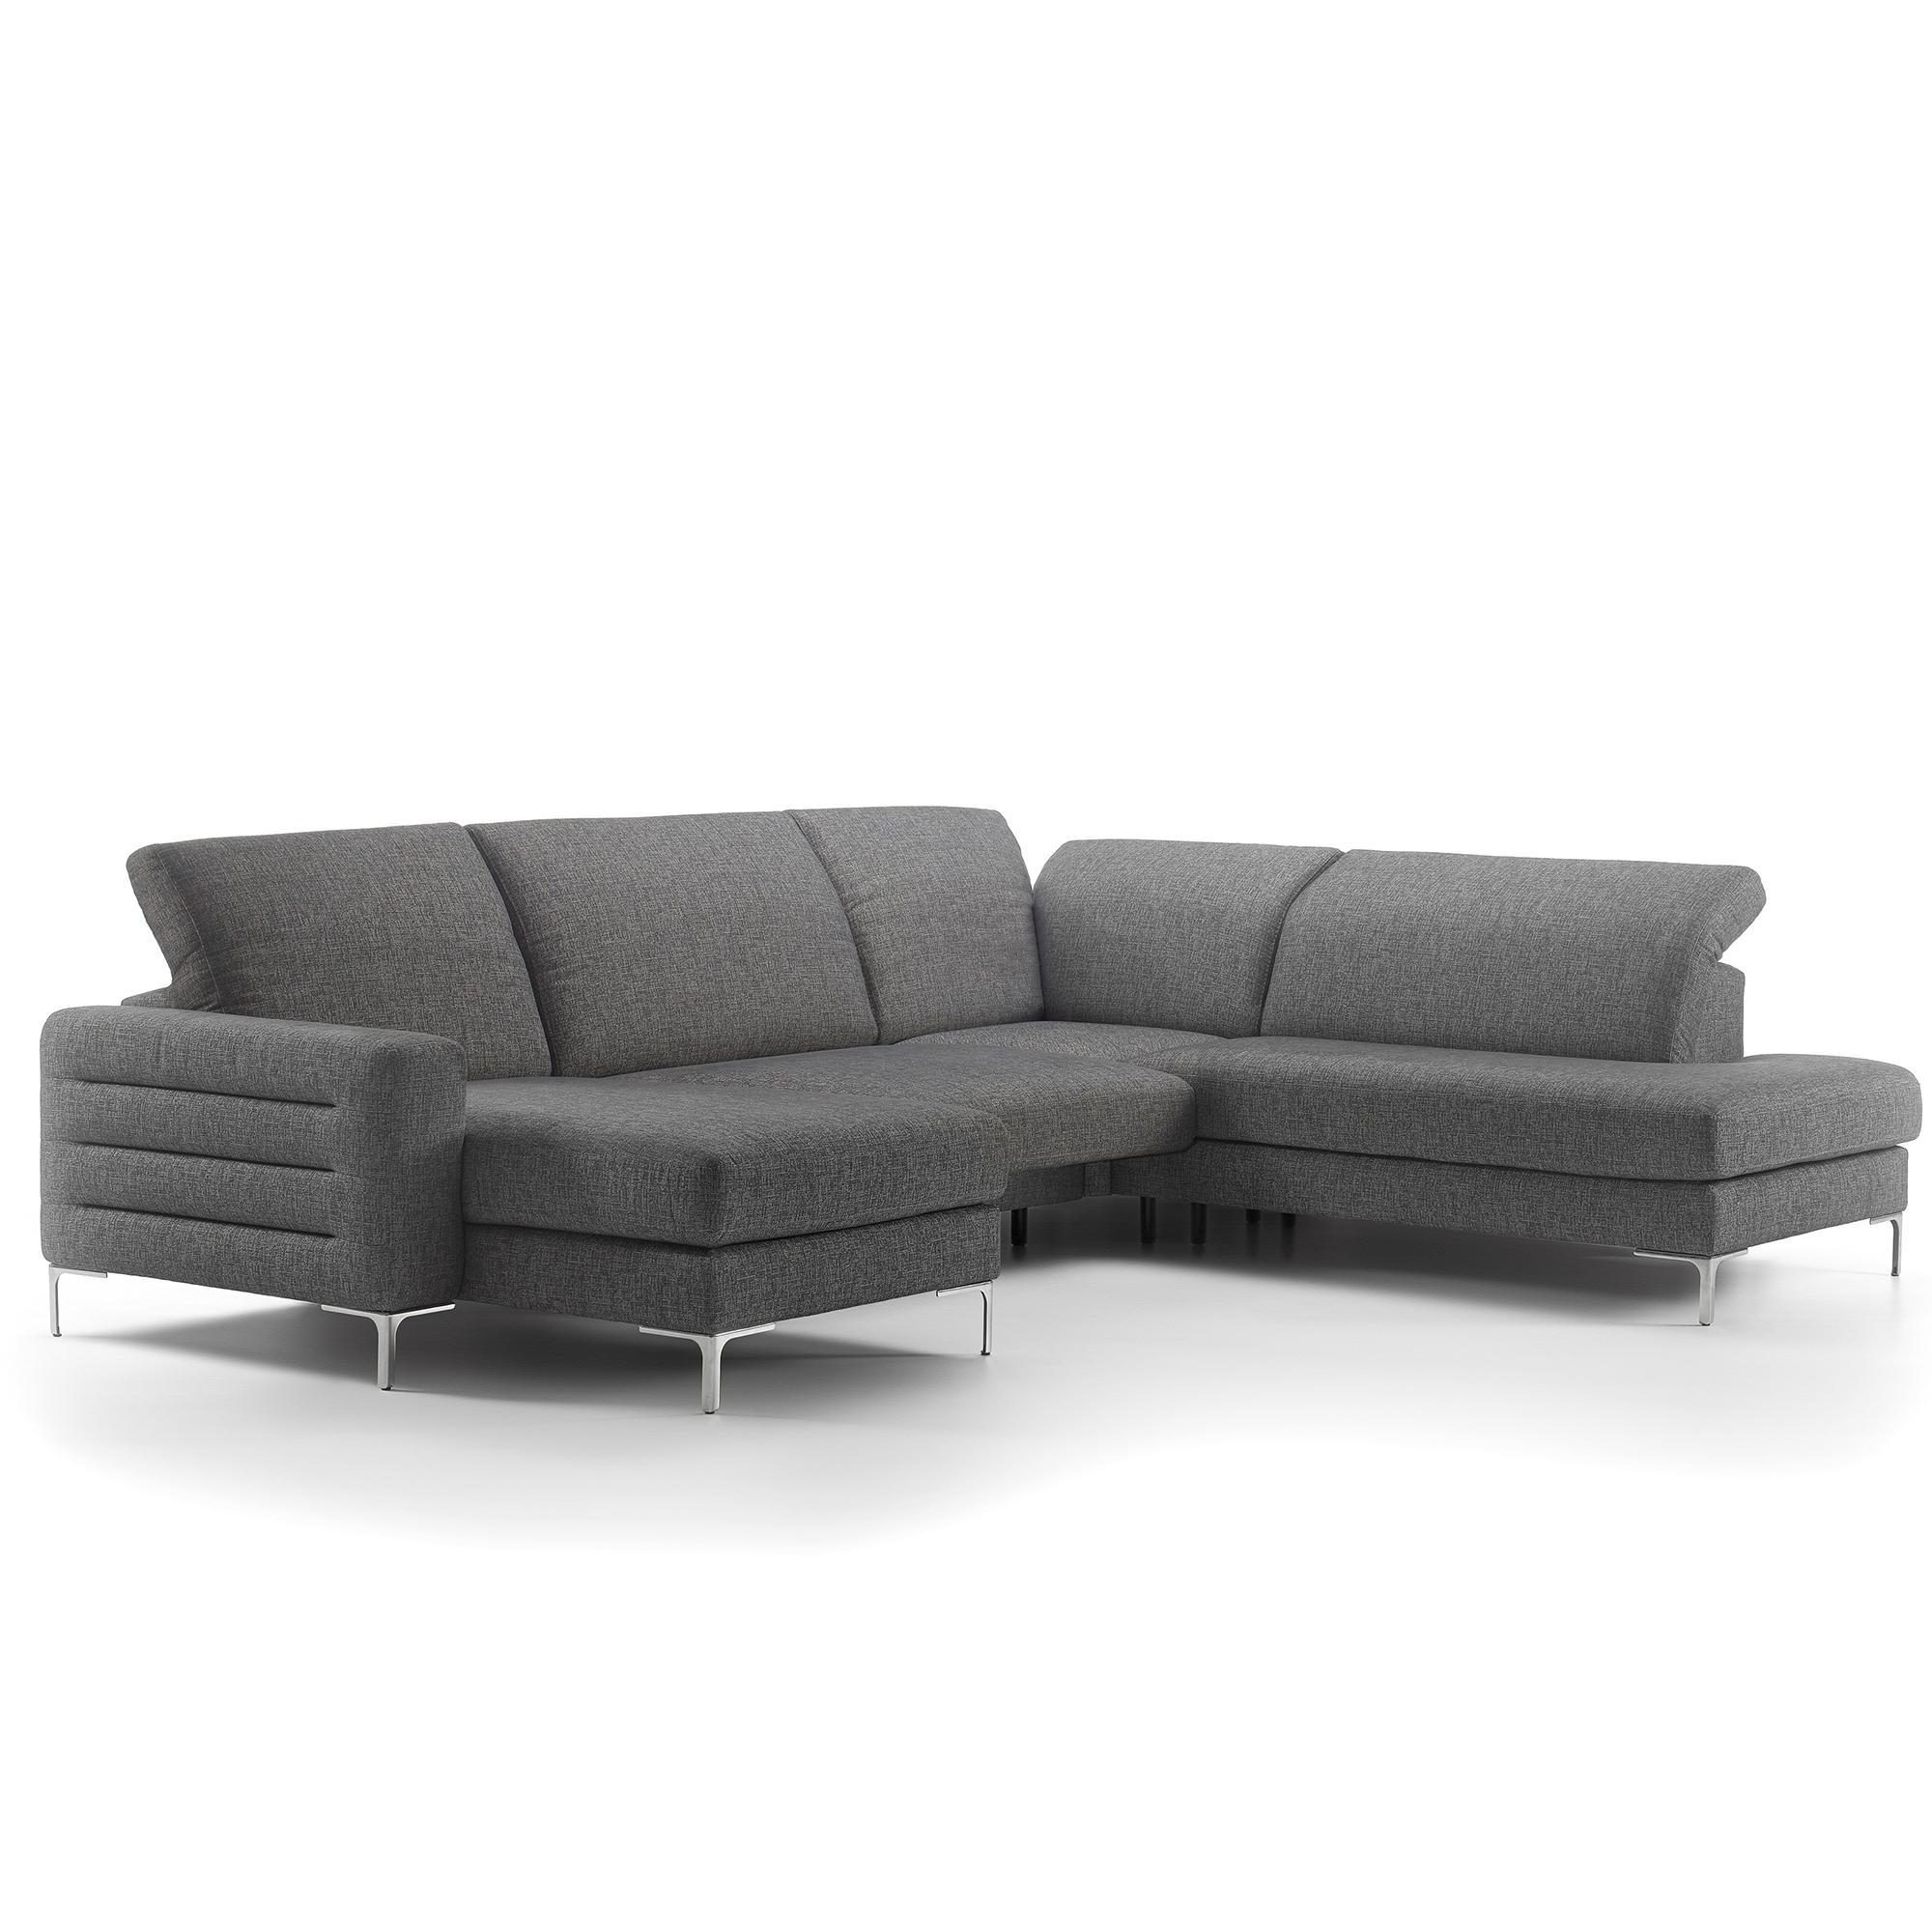 Rom Maori Corner Sofa – Leather Sofas – Cookes Furniture With Regard To Corner Sofa Leather (Image 16 of 20)